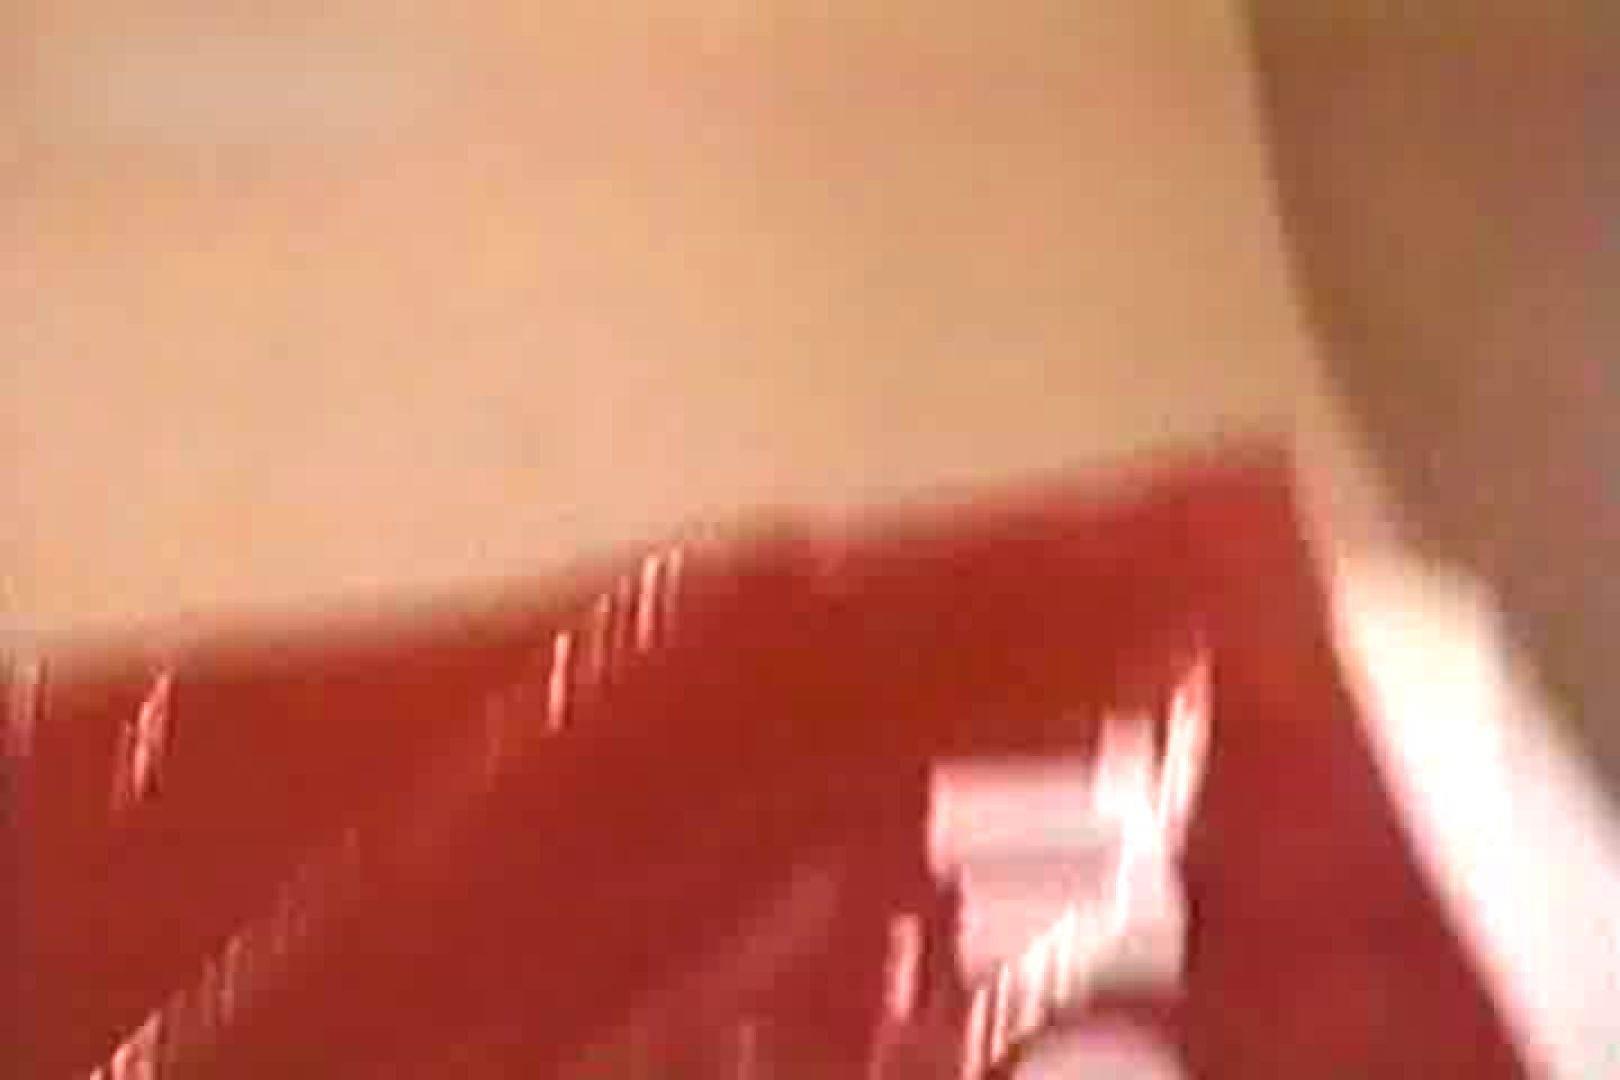 RQカメラ地獄Vol.23 勃起 オマンコ動画キャプチャ 106pic 96